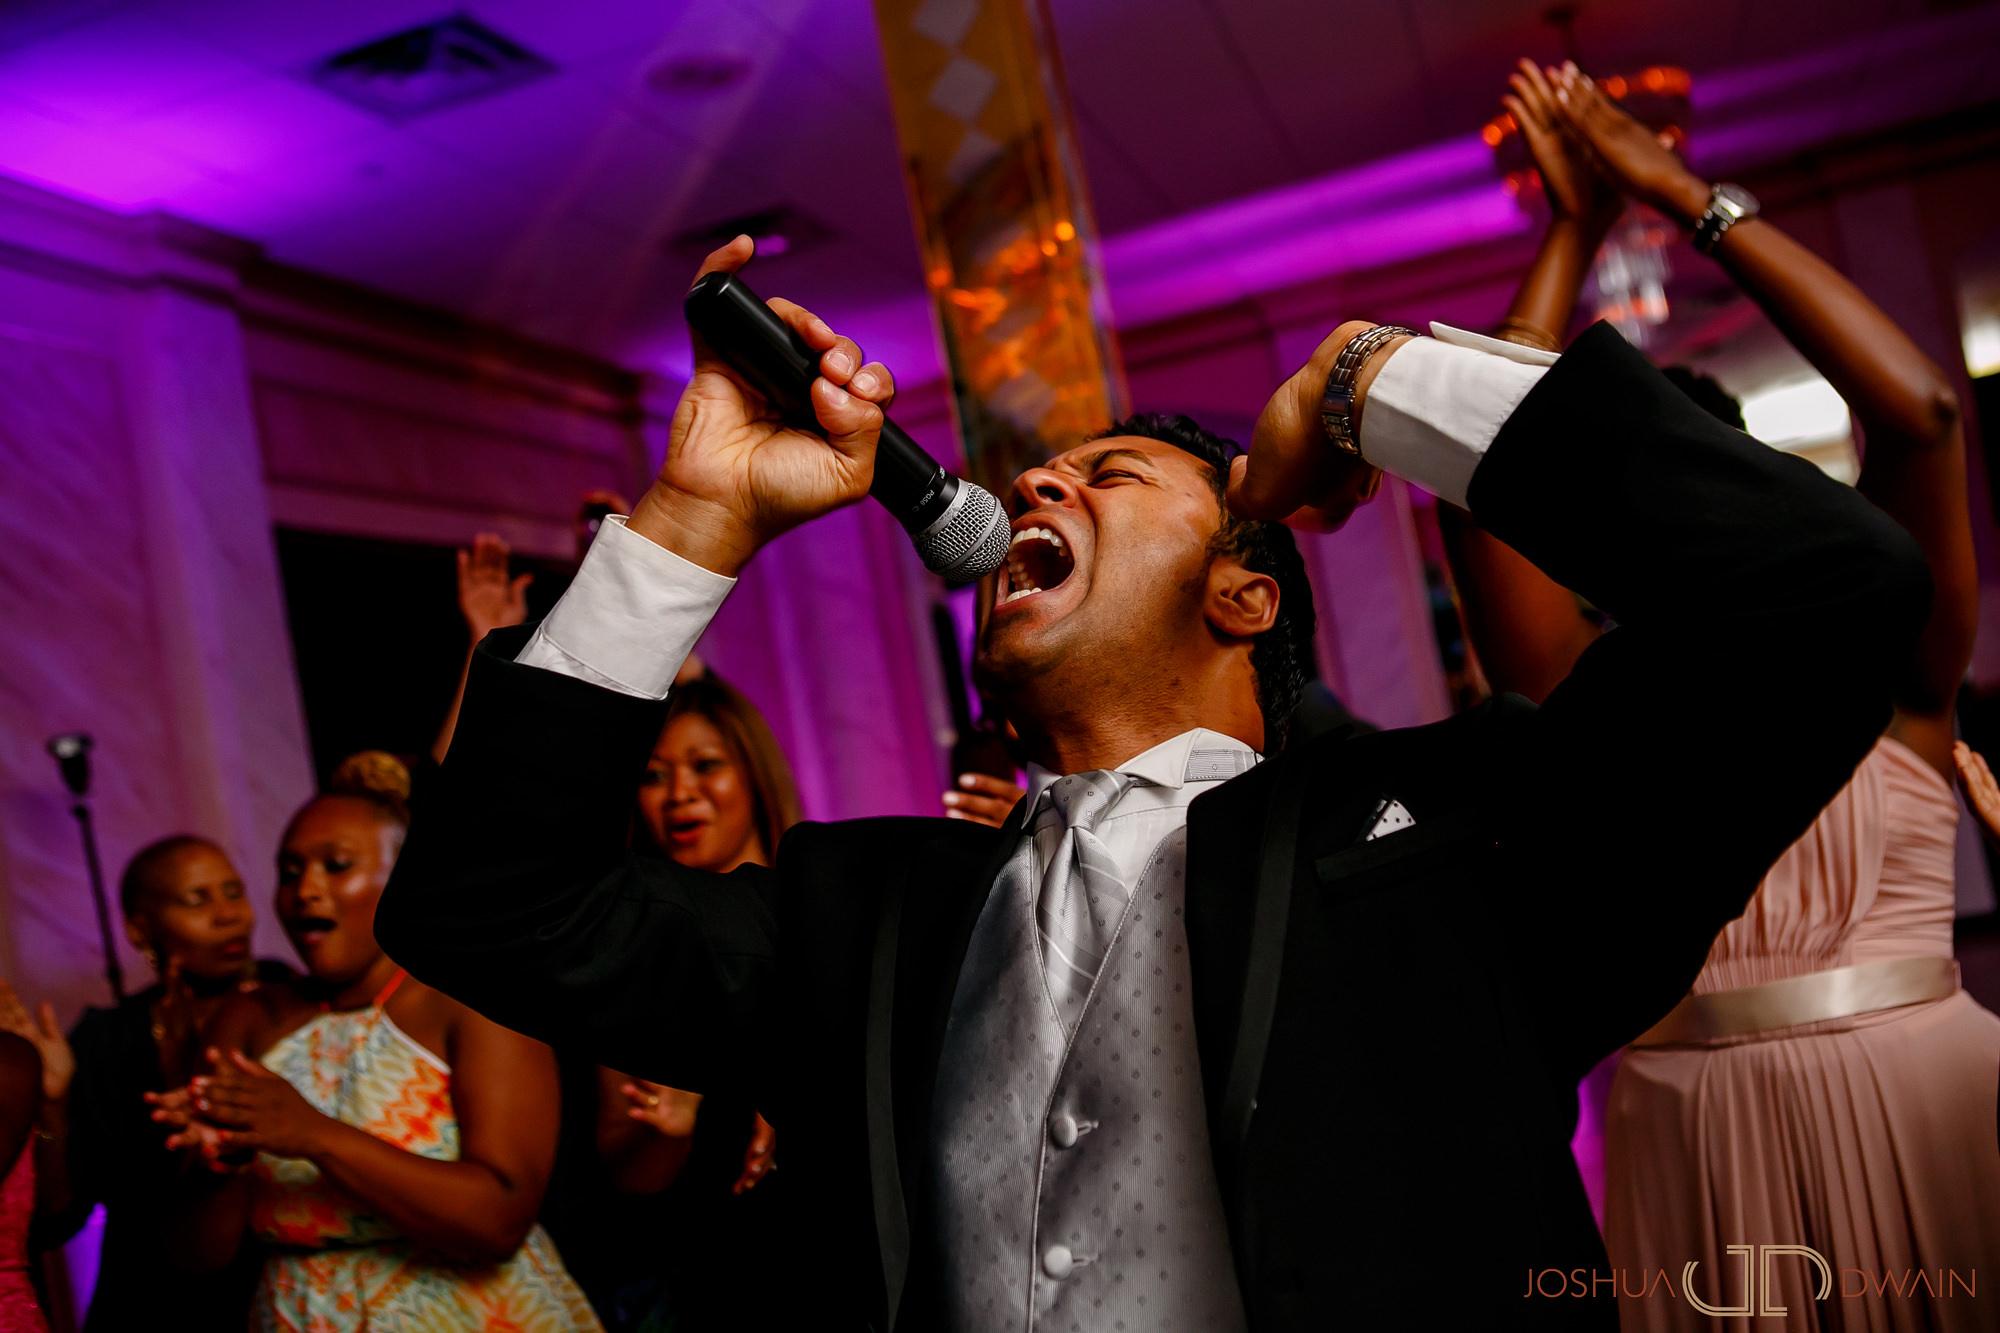 abeena-harold-015-giandos-on-the-water-brooklyn-new-york-wedding-photographer-joshua-dwain